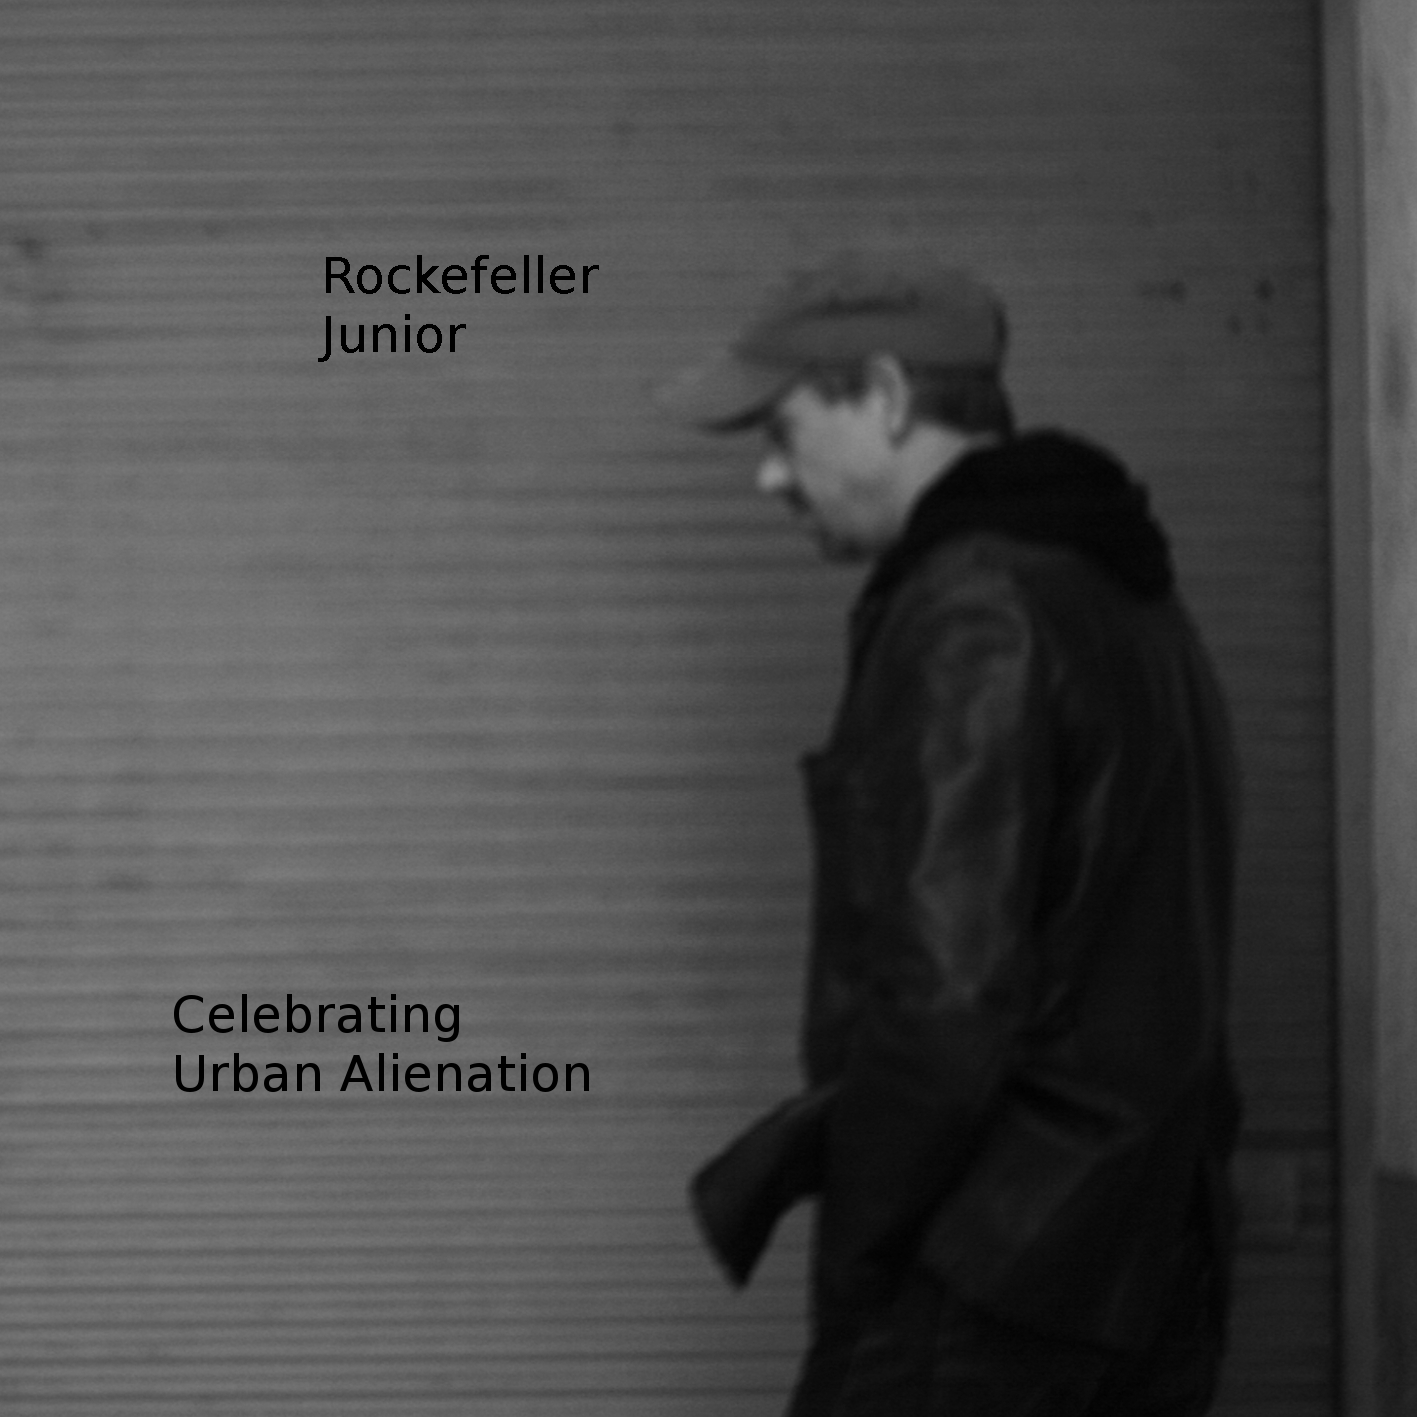 RJR_Cover_Celebrating_Urban_Alienation_300ppi